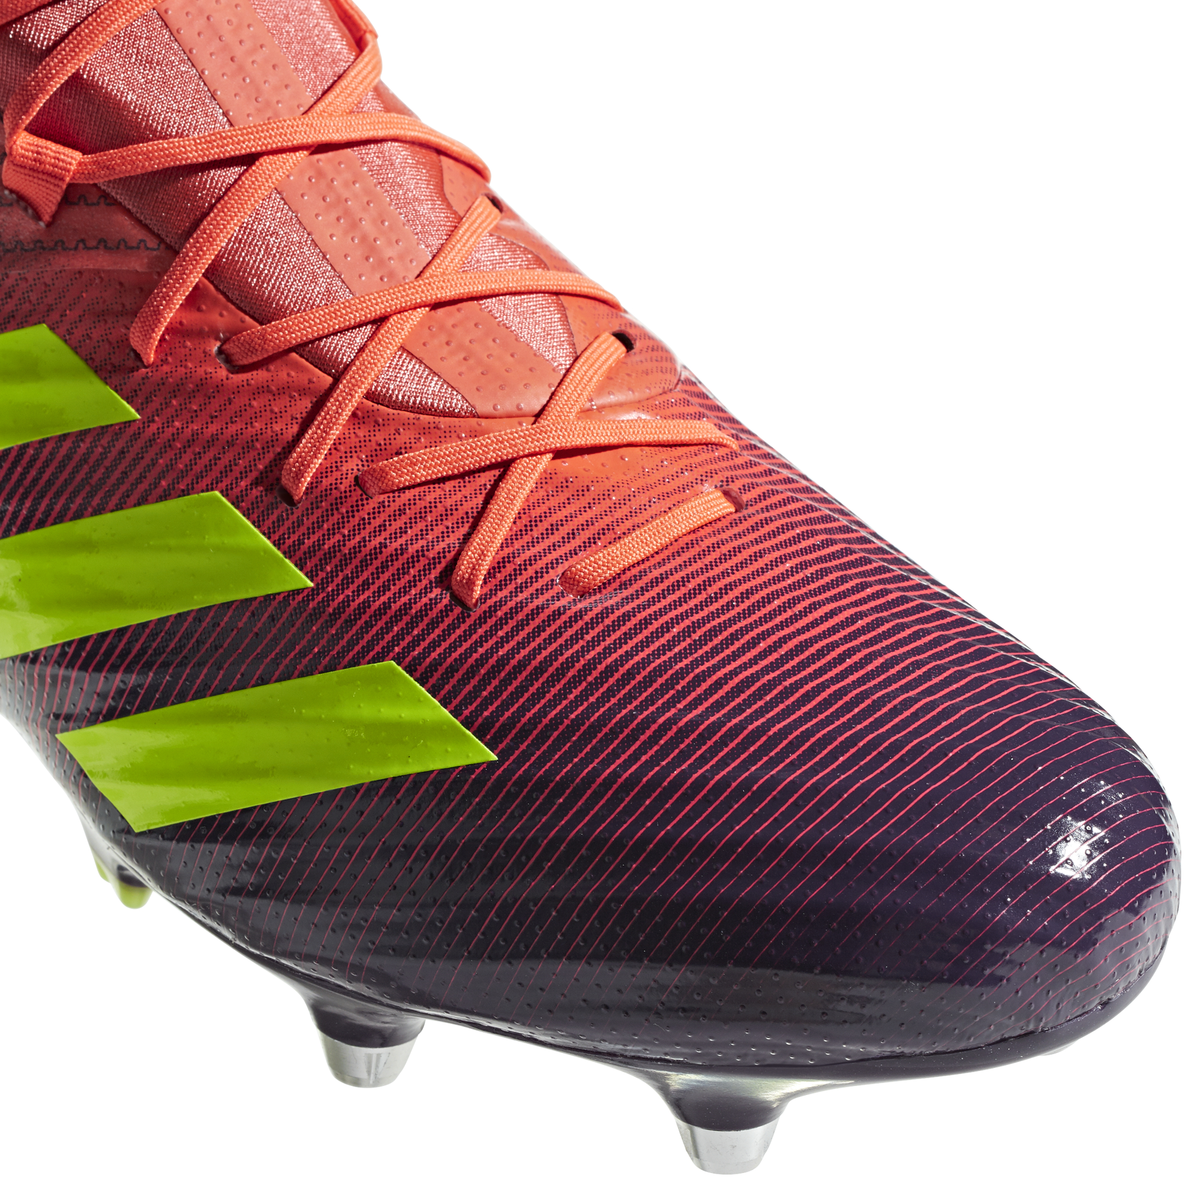 94b4f87a359 ... adidas Predator Flare Rugby Boots Legend Purple - Detail 3